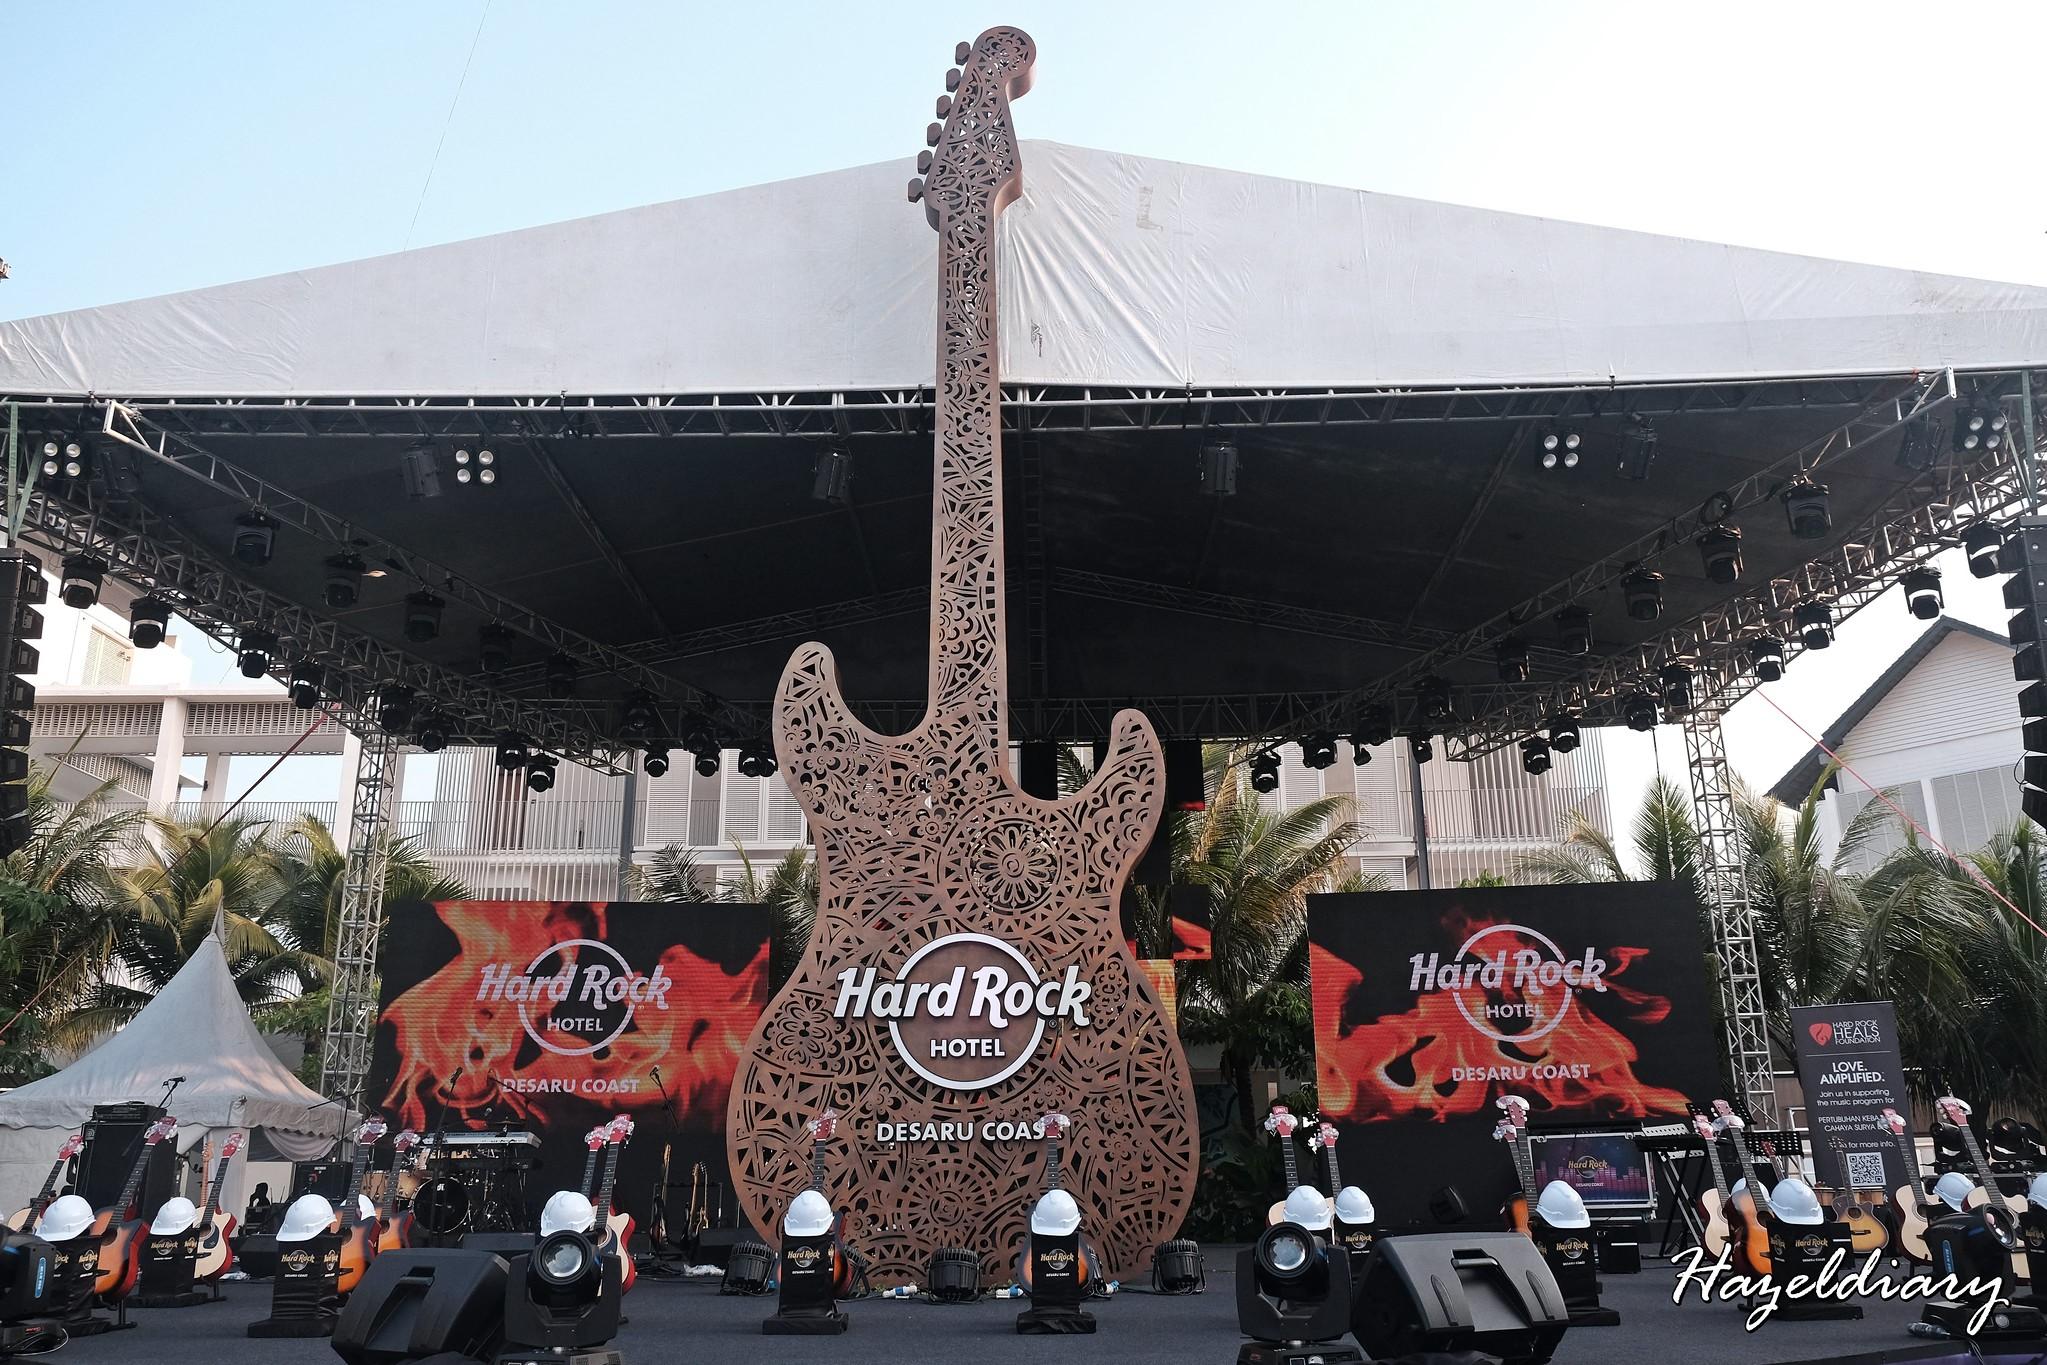 Hard Rock Hotel Desaru Coast-Grand Opening Party